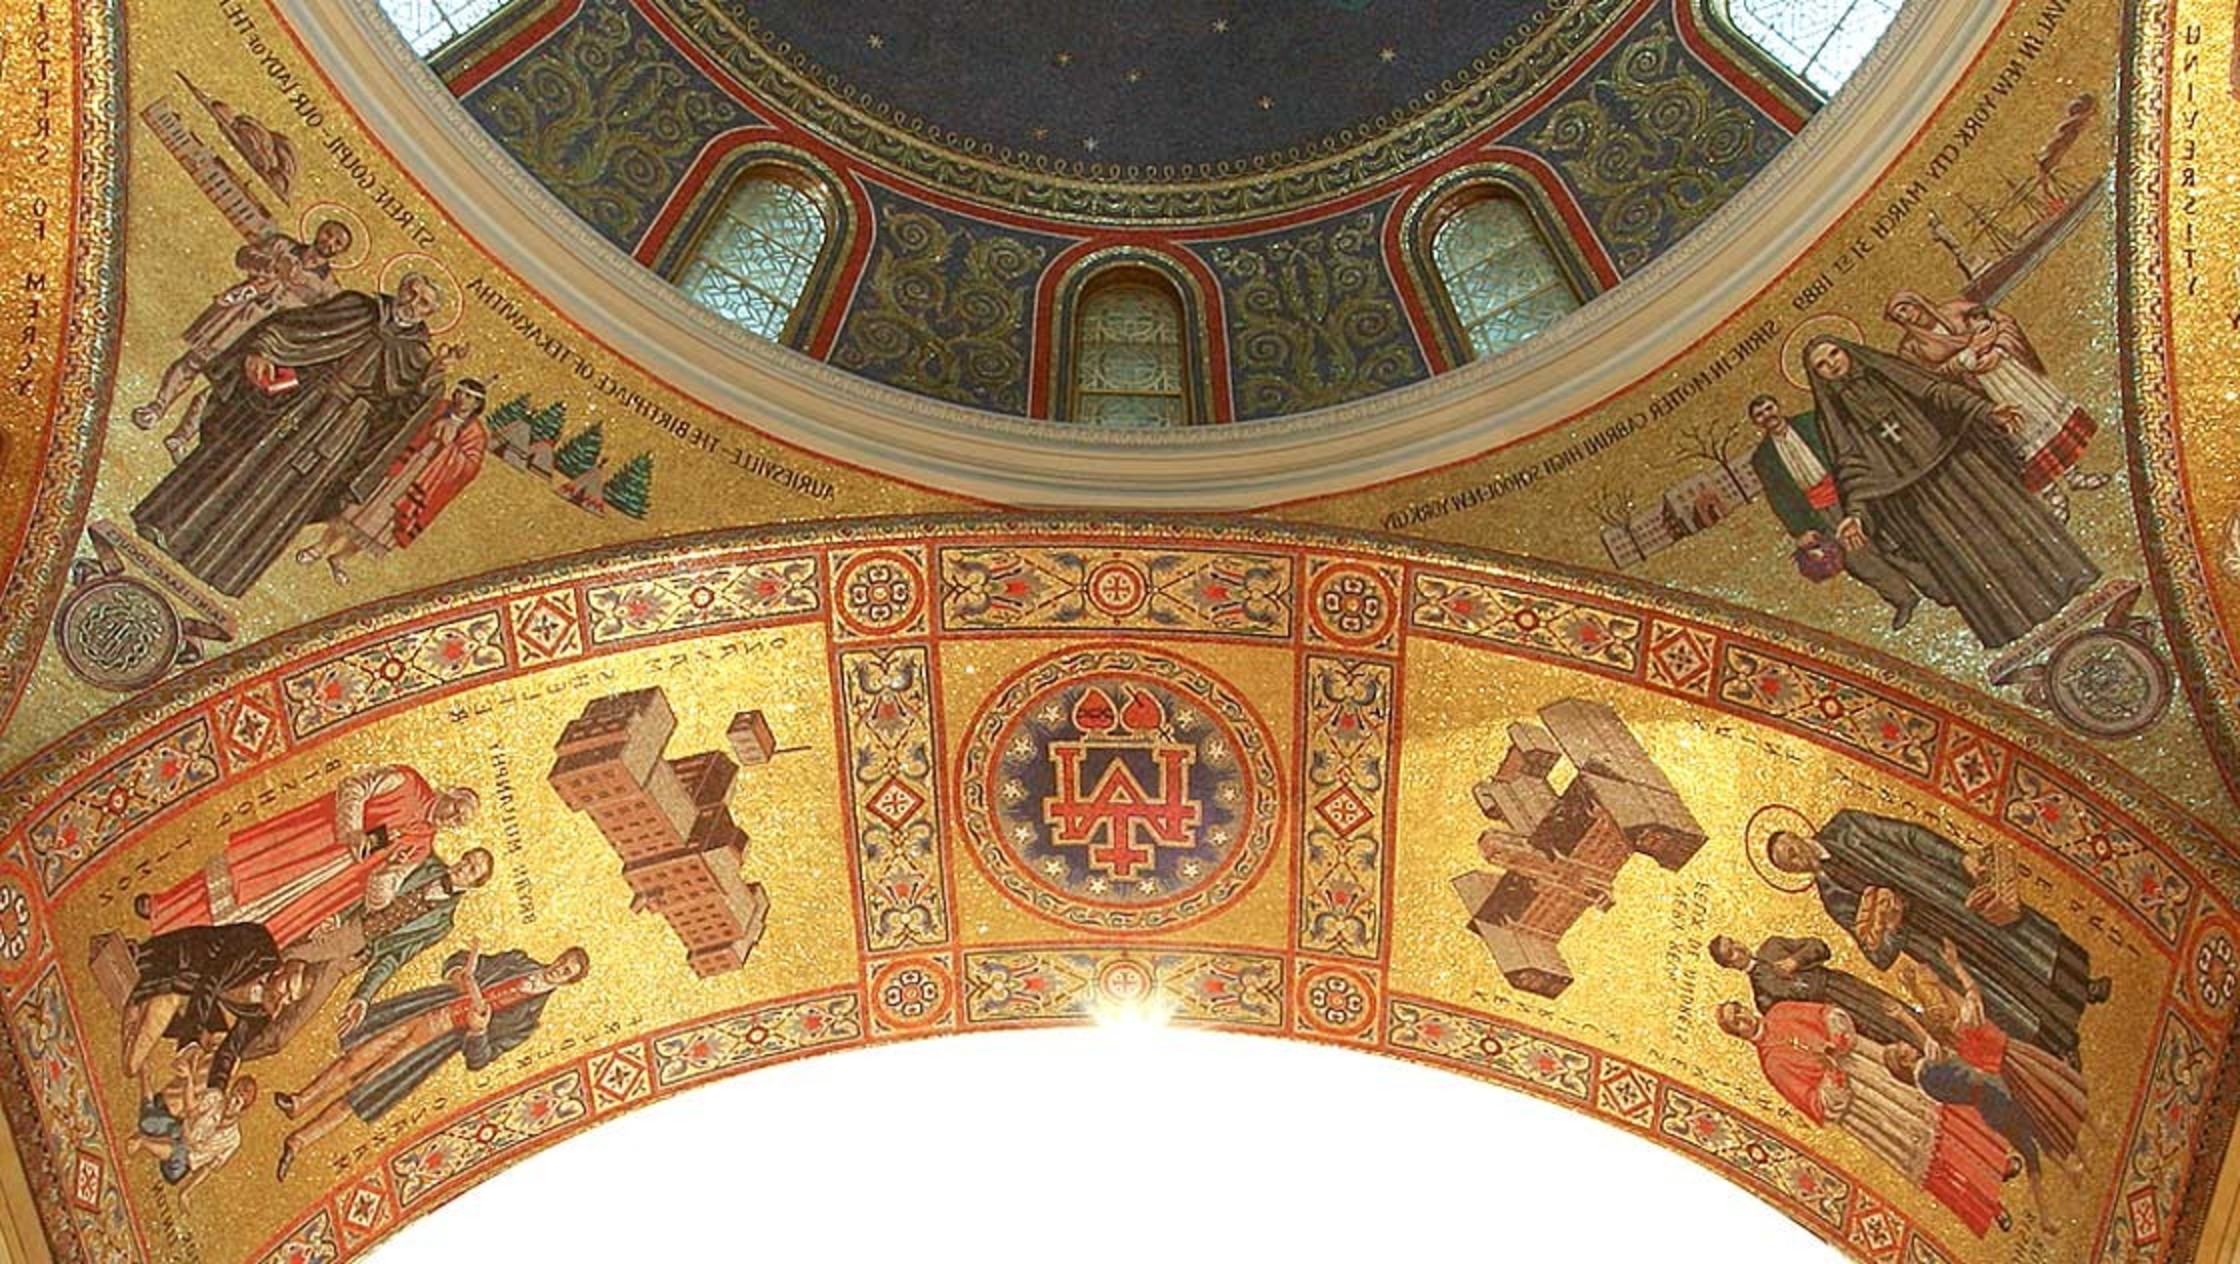 Hildreth Meiere Cathedral Basical Of Saint Louis Four Arch Soffits St Vincent De Paul And Followers